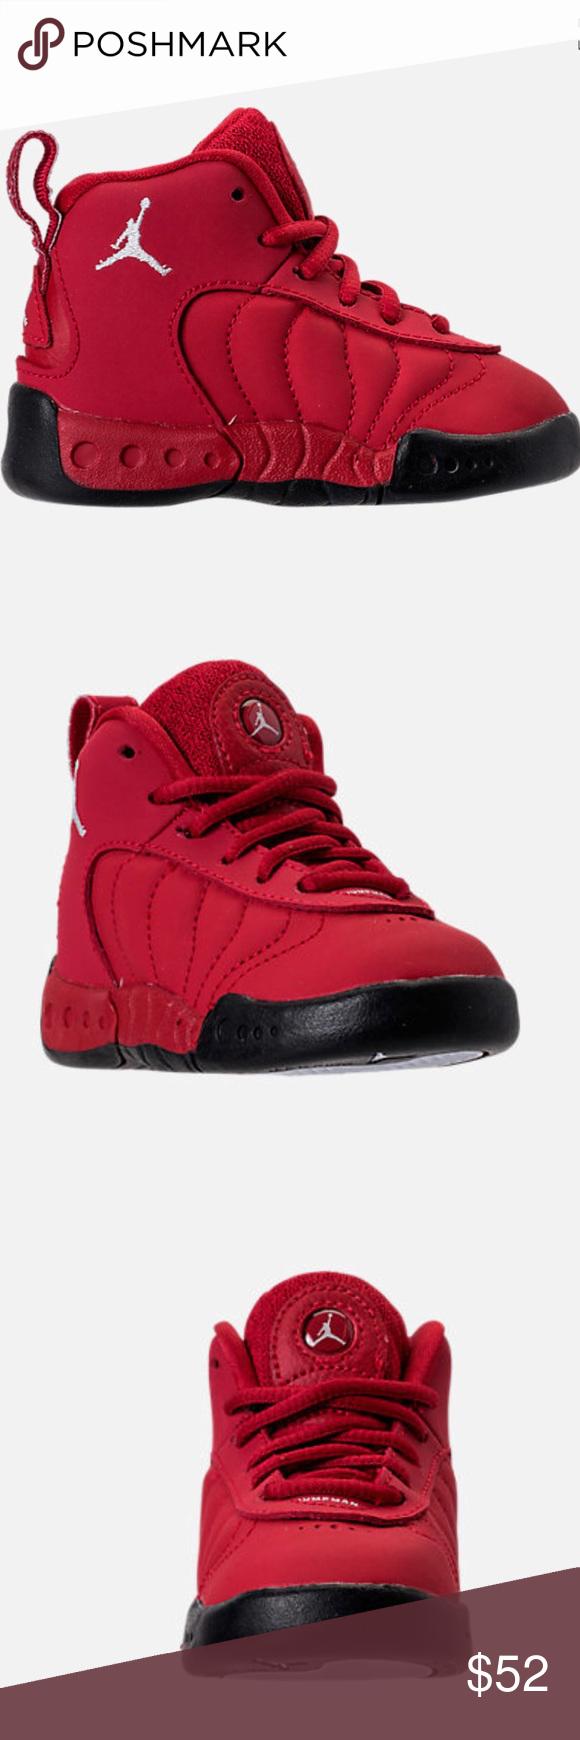 SOLD Toddler Jordan Jumpman ProBasketball Shoes 5 Shoes